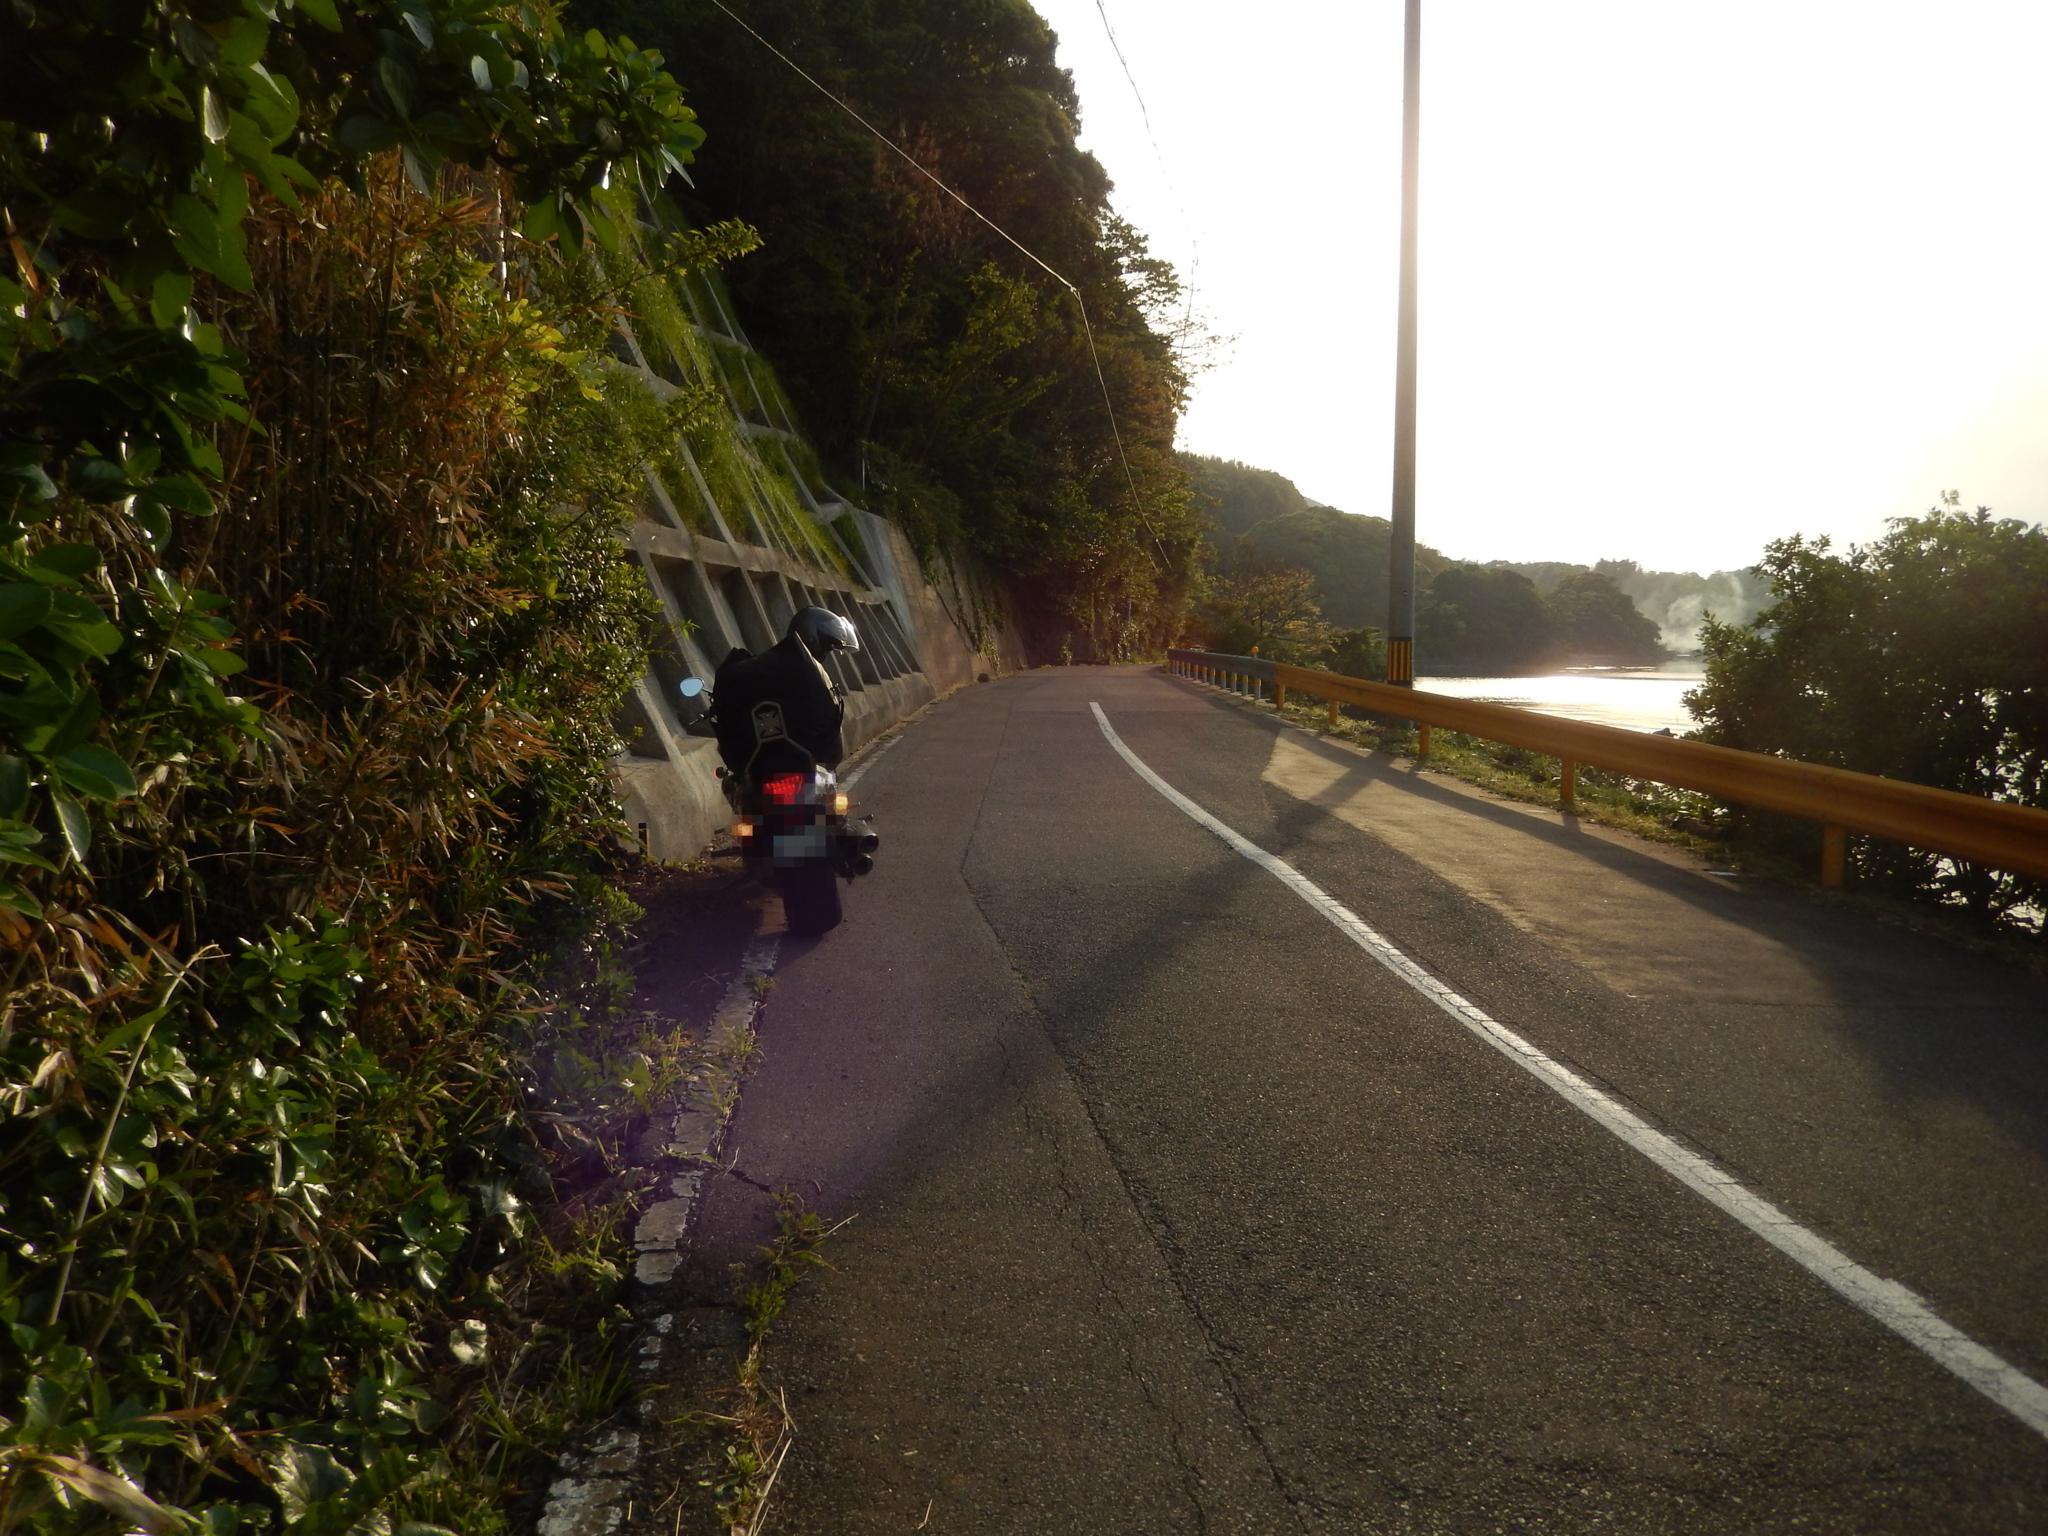 f:id:ToshUeno:20150502174444j:plain